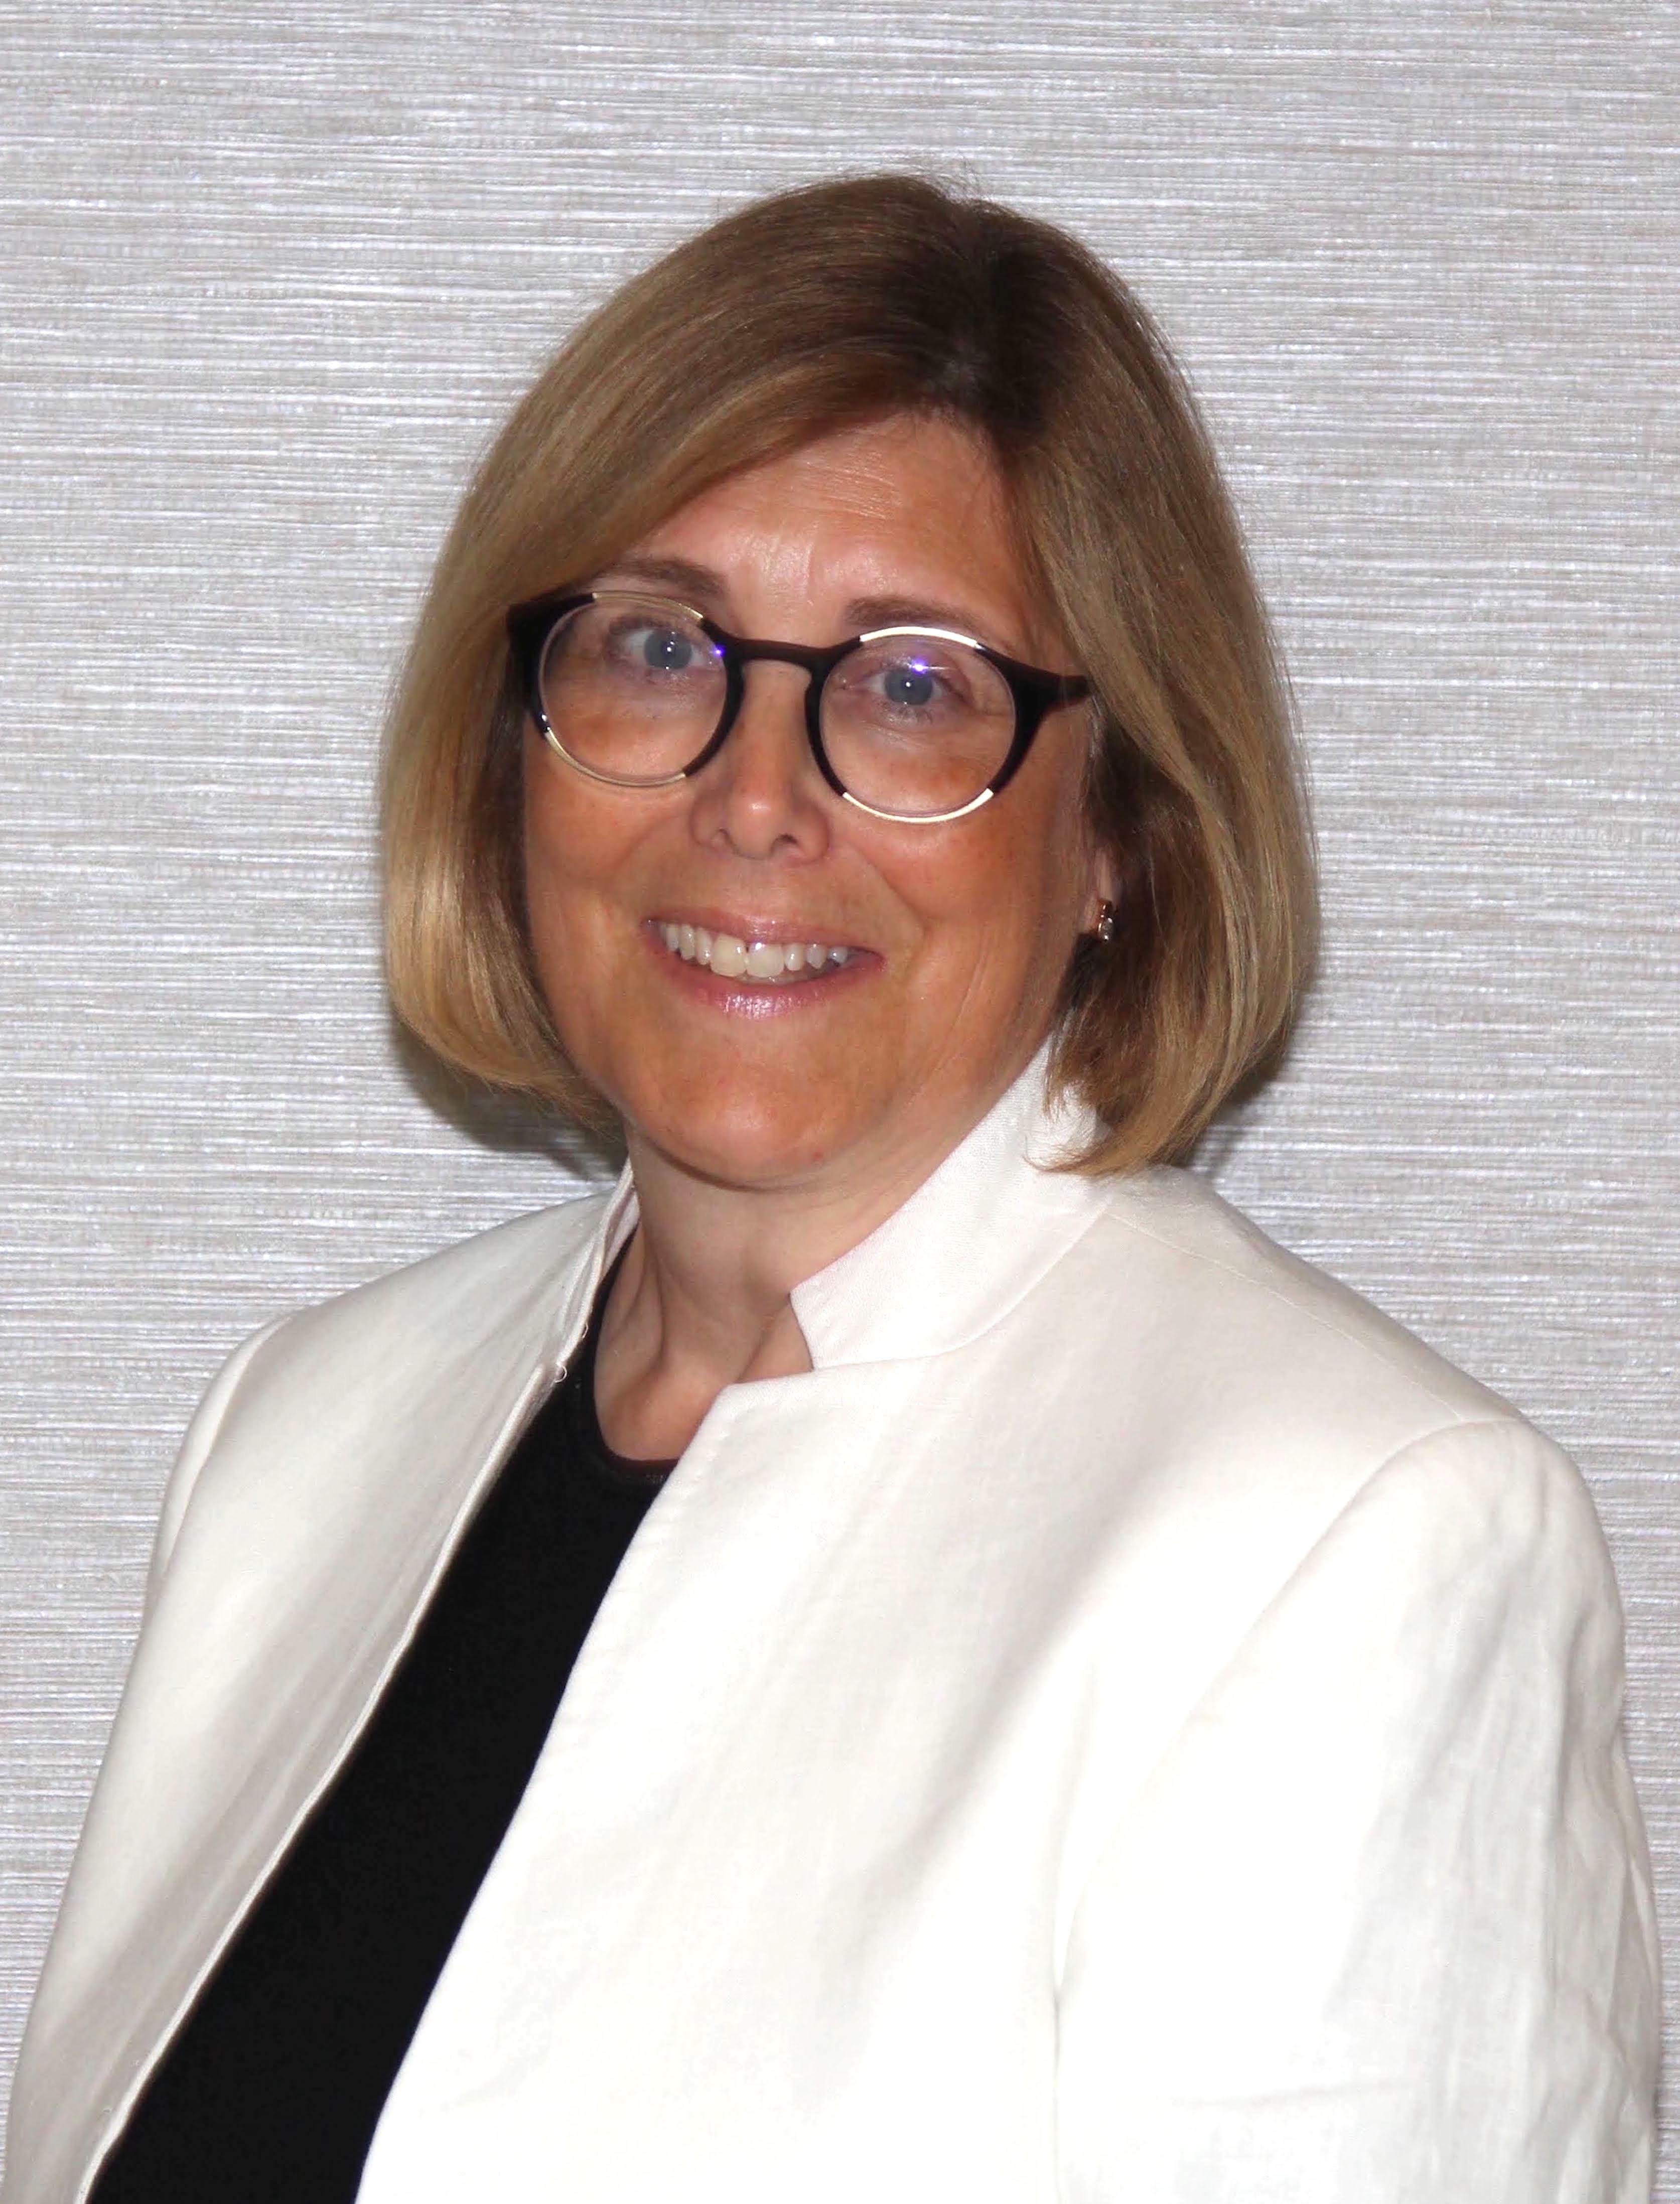 Dr. Andrea Tejedor